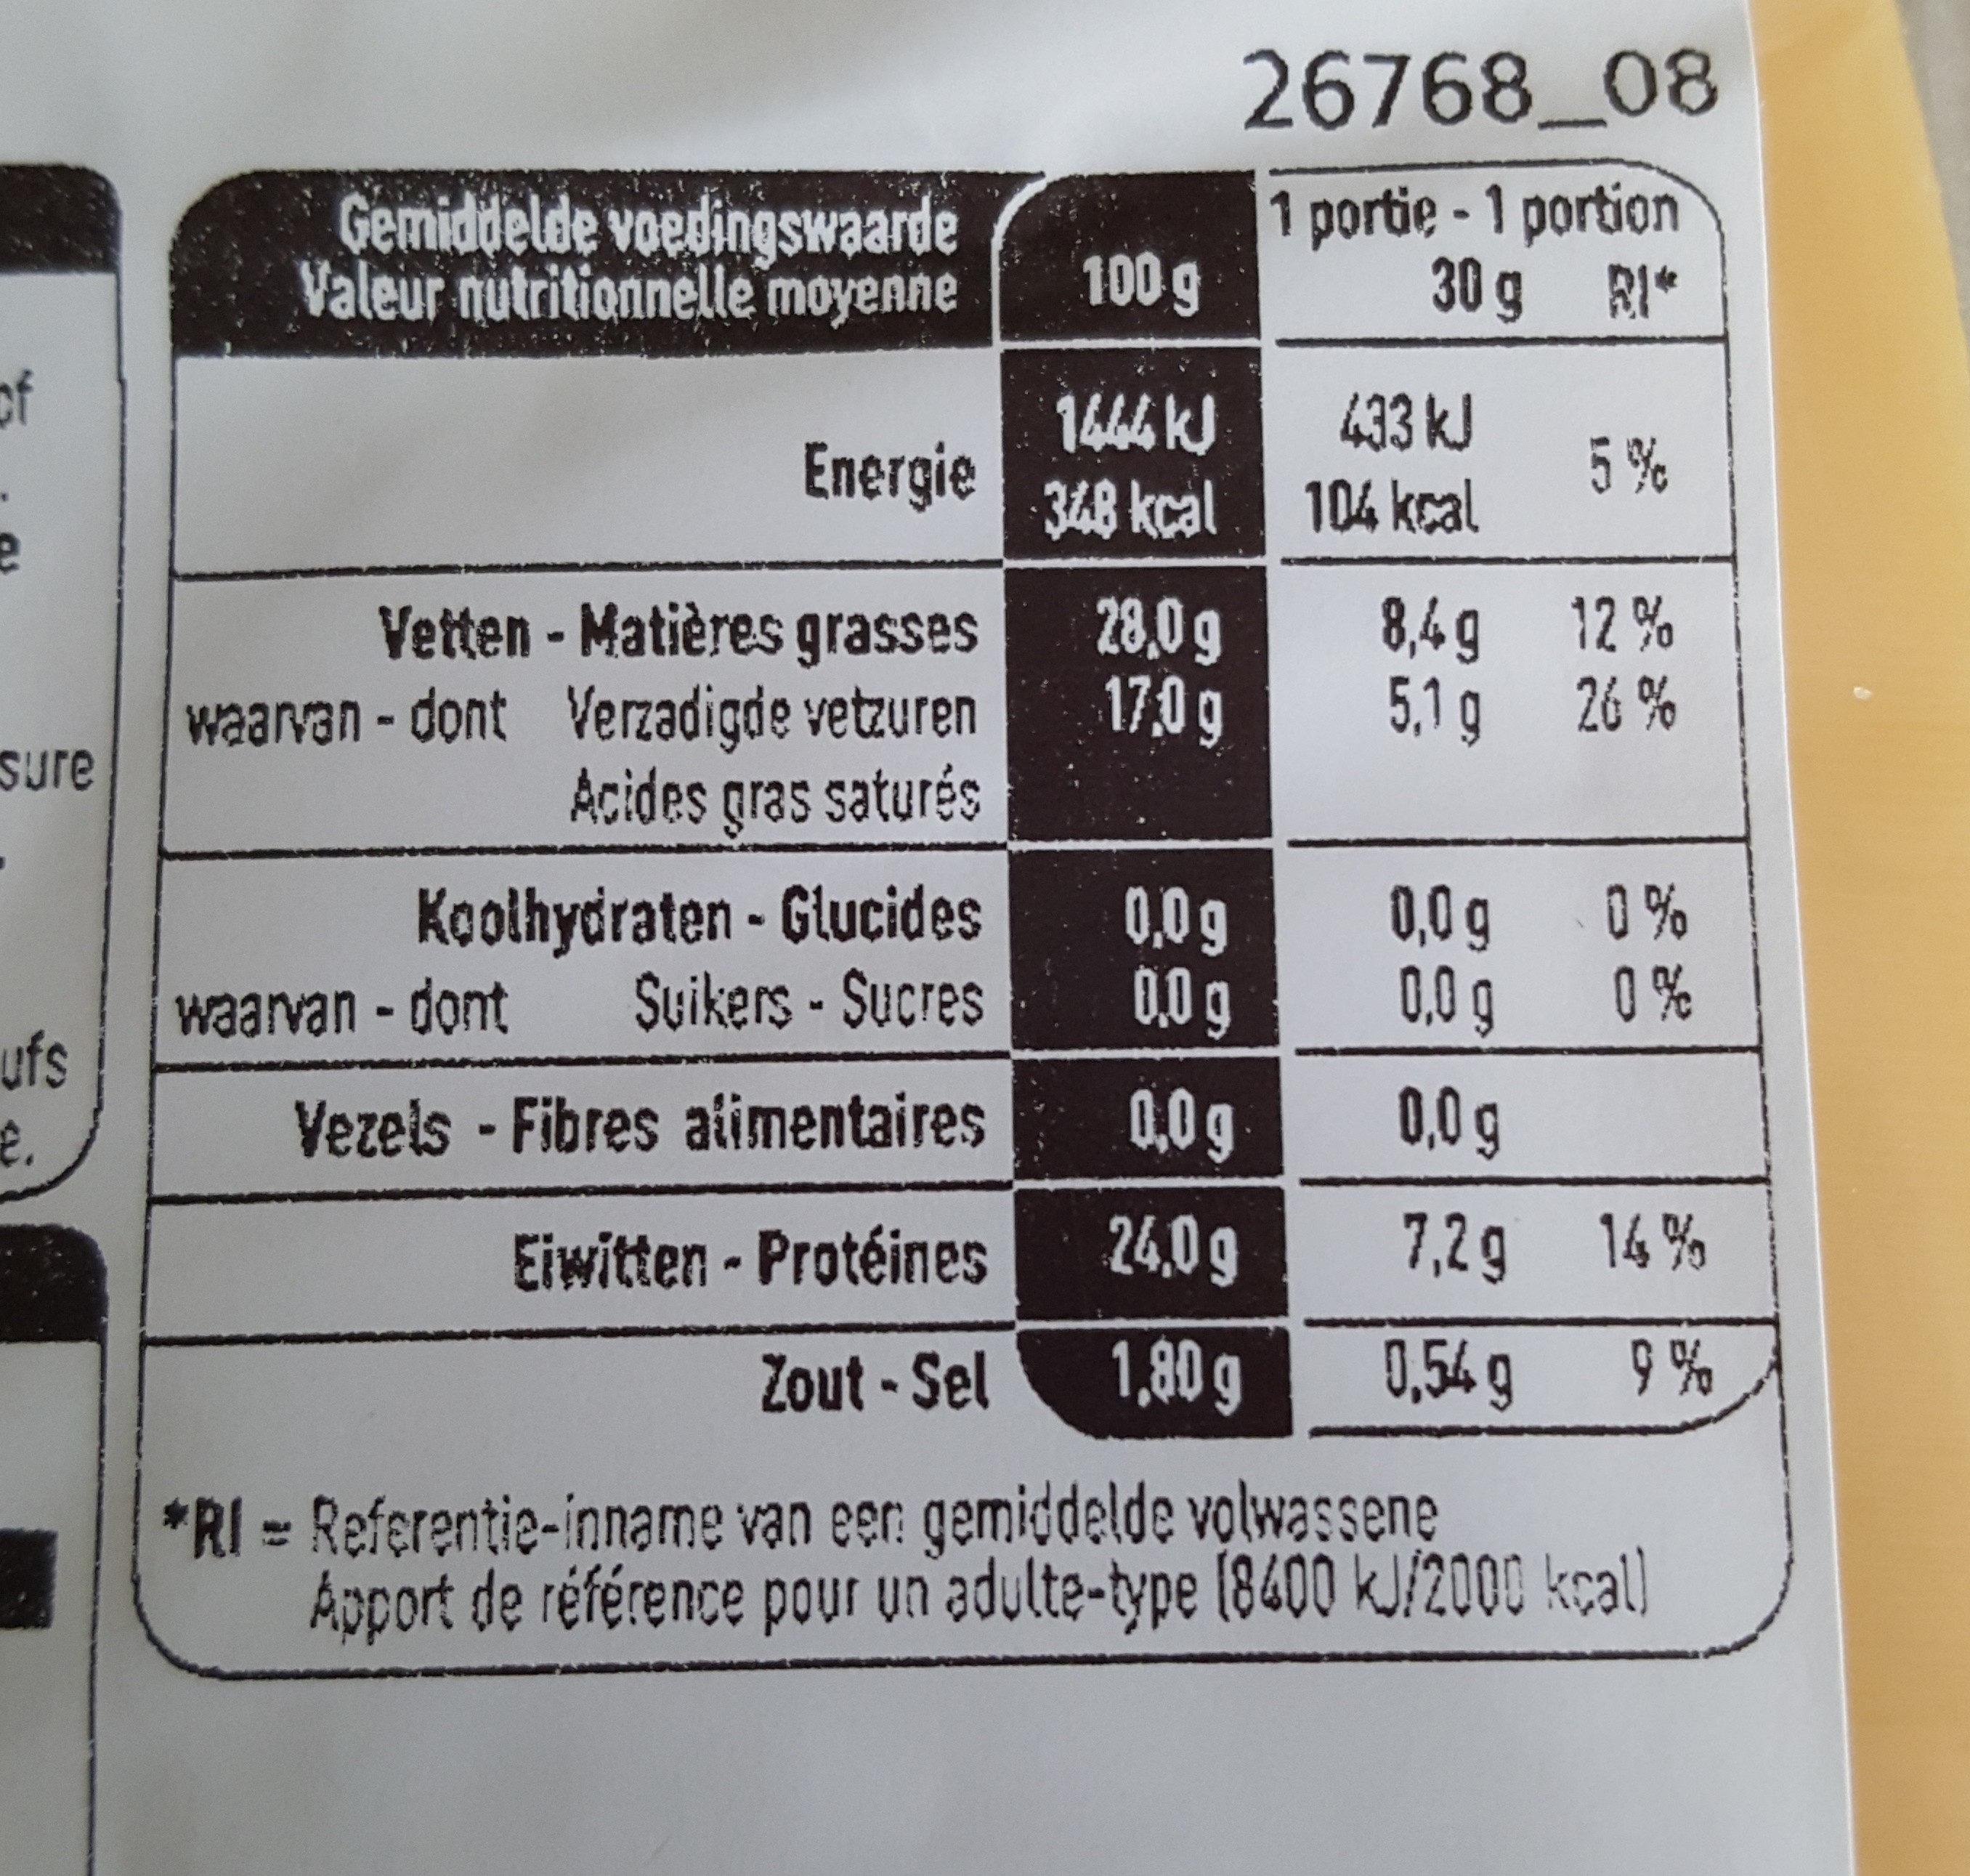 Gouda jeune - Nutrition facts - fr